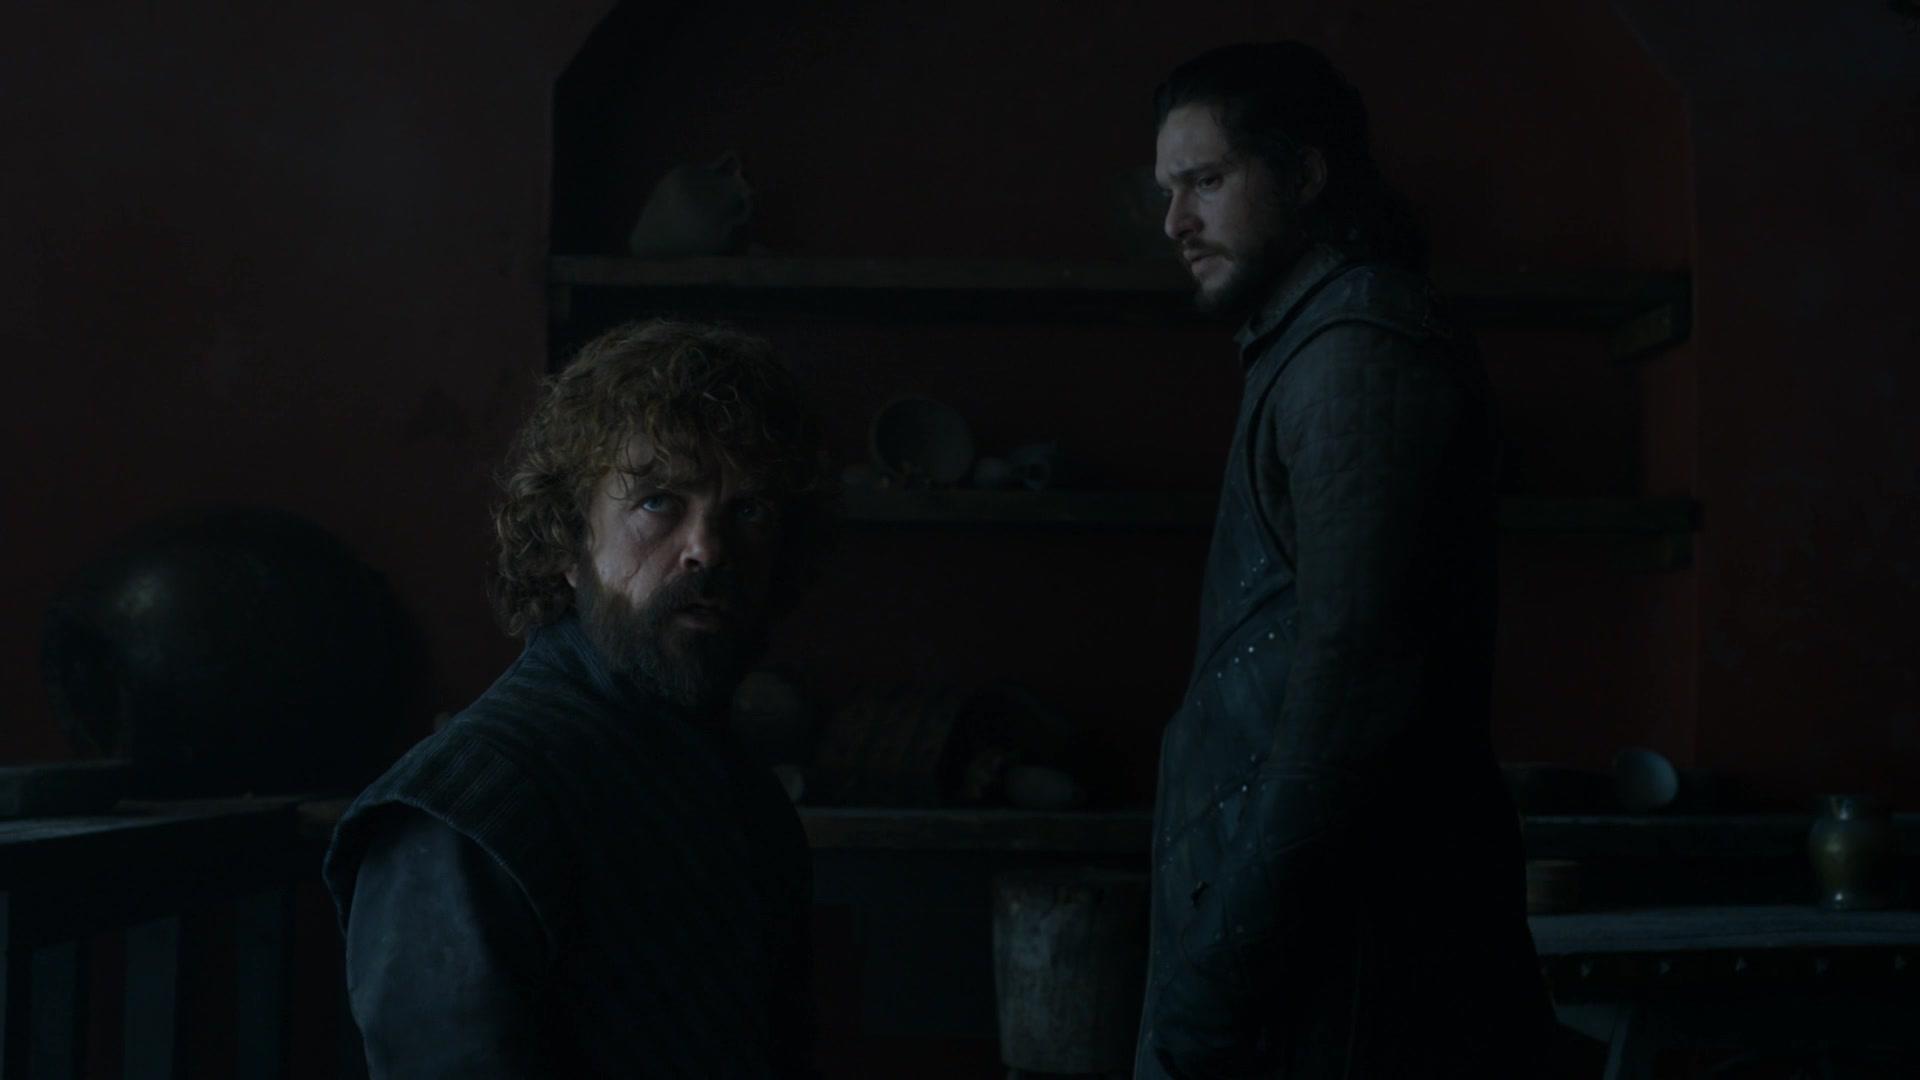 Game of Thrones S08E06 - Final